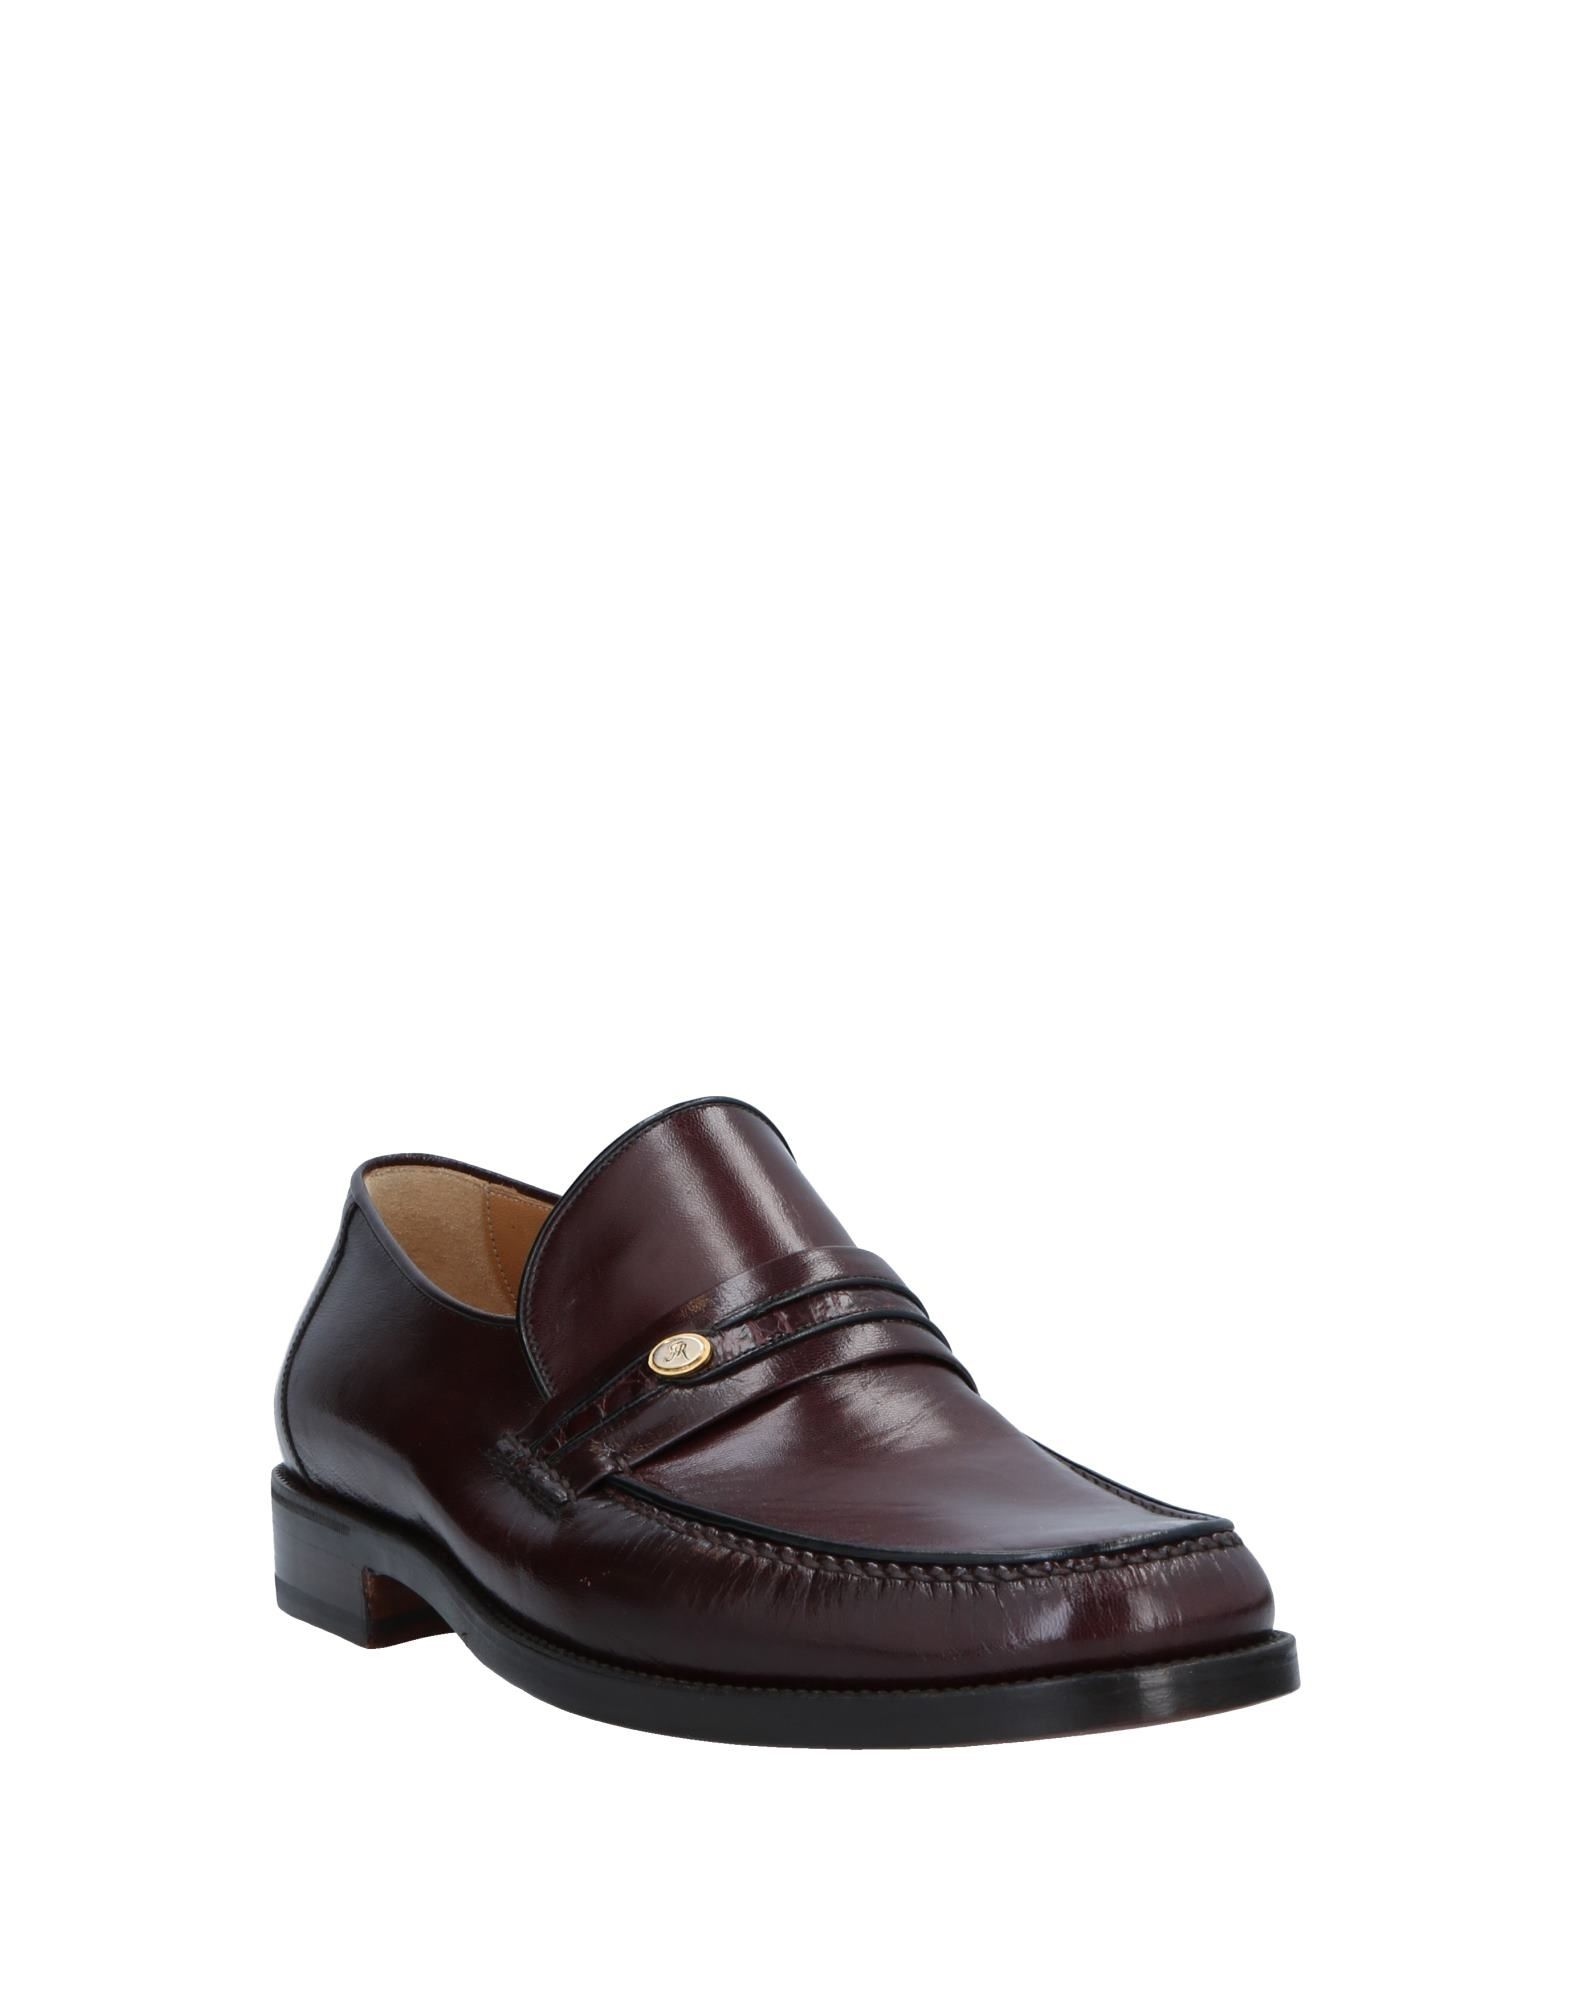 Rabatt Mokassins echte Schuhe Renzo Favero Mokassins Rabatt Herren  11544983KF 94a3d8